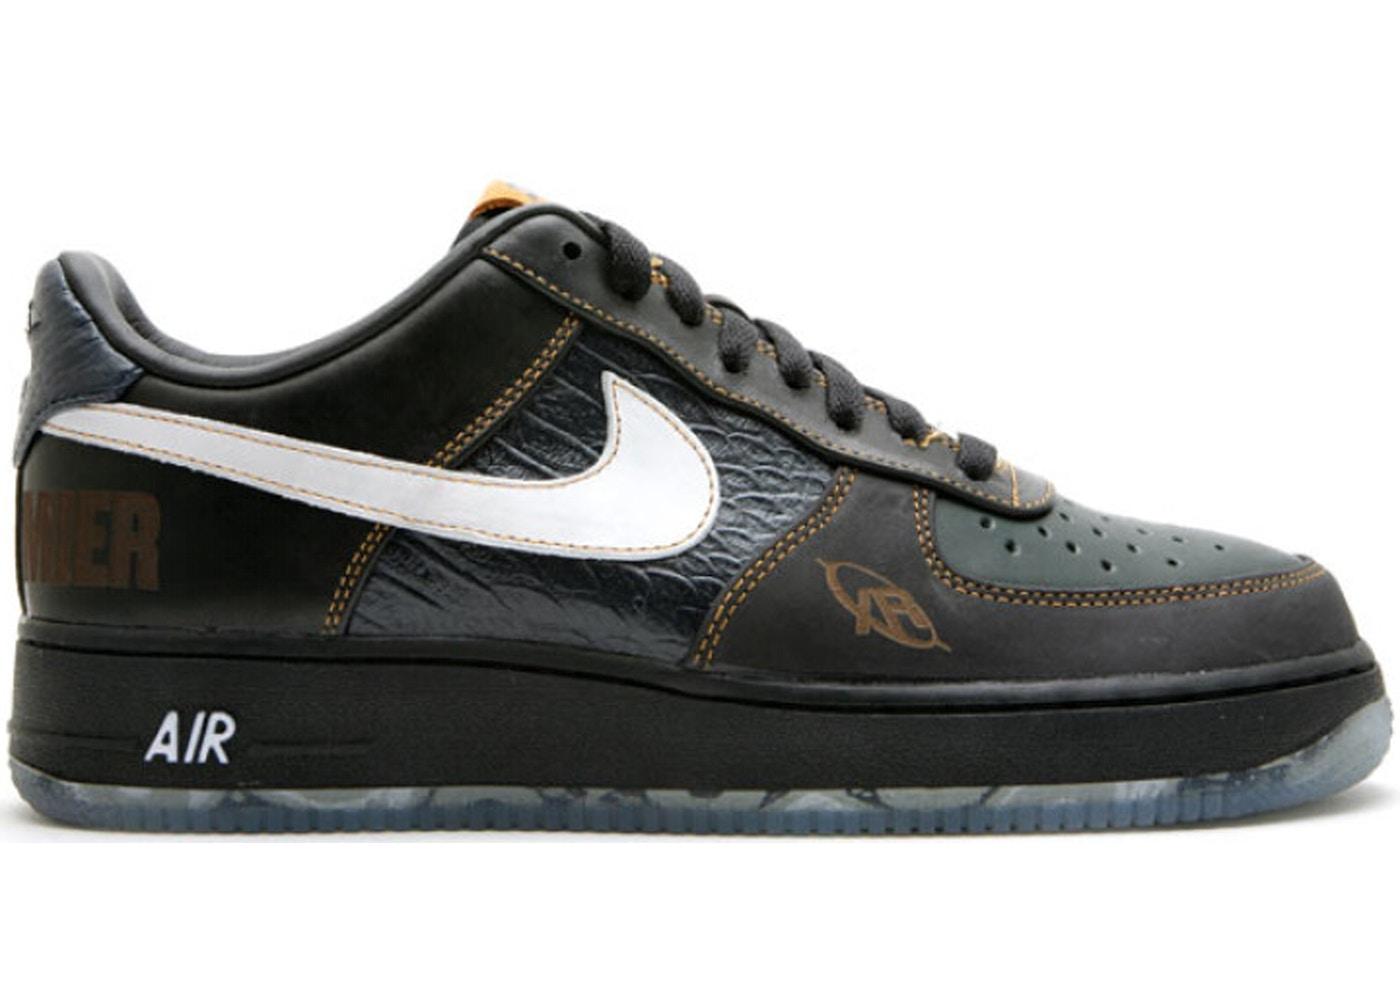 Tranquilidad de espíritu lava cisne  Nike Air Force 1 Low DJ Premier - 395178-001